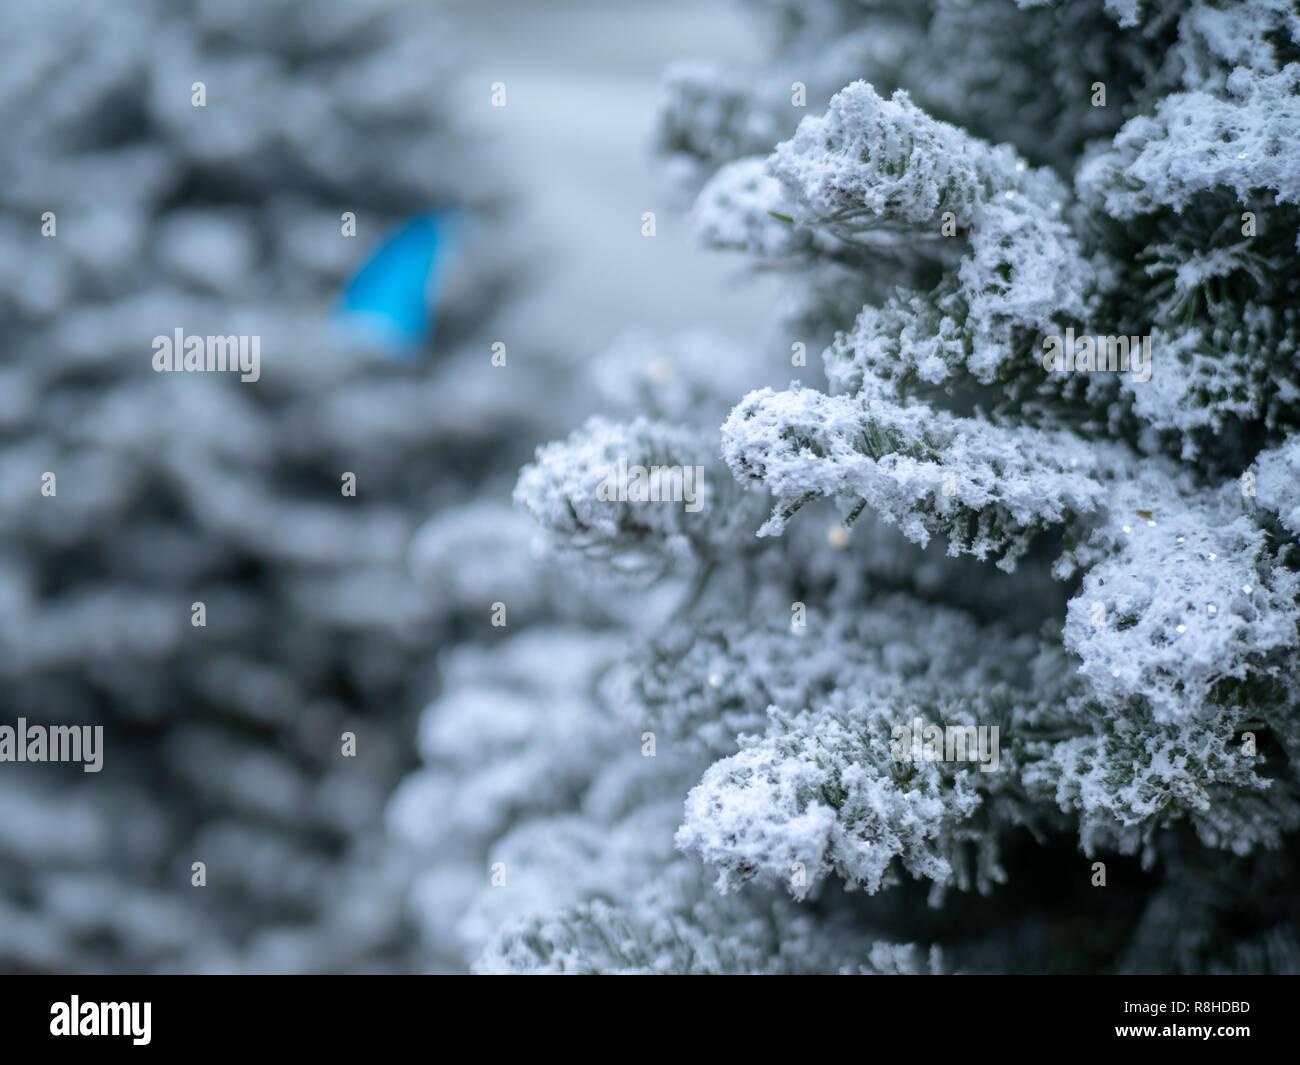 Christmas Tree Spray Snow.Close Up Of Christmas Tree Covered In White Flocking Spray